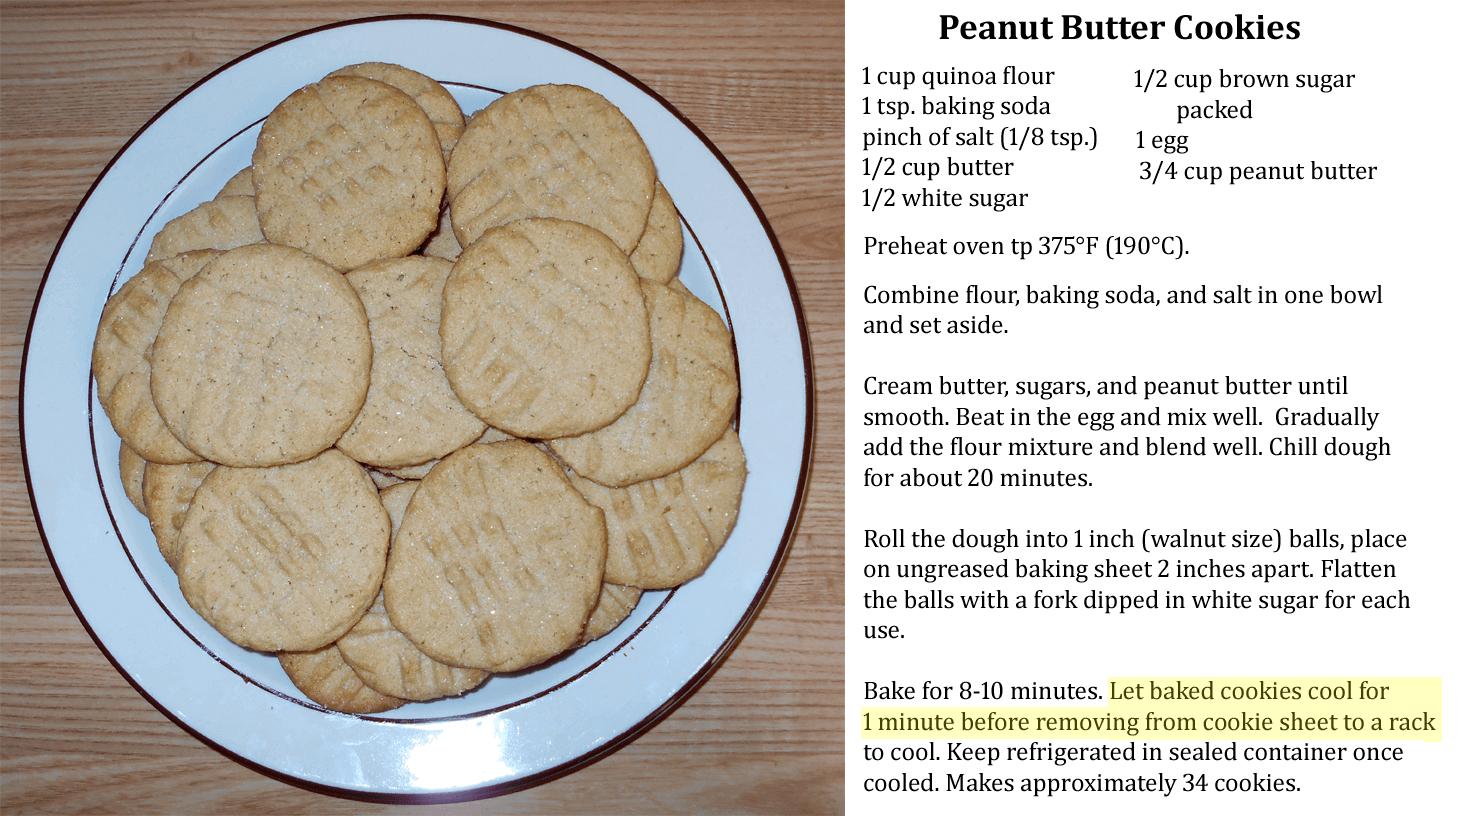 peanut butter recipe card